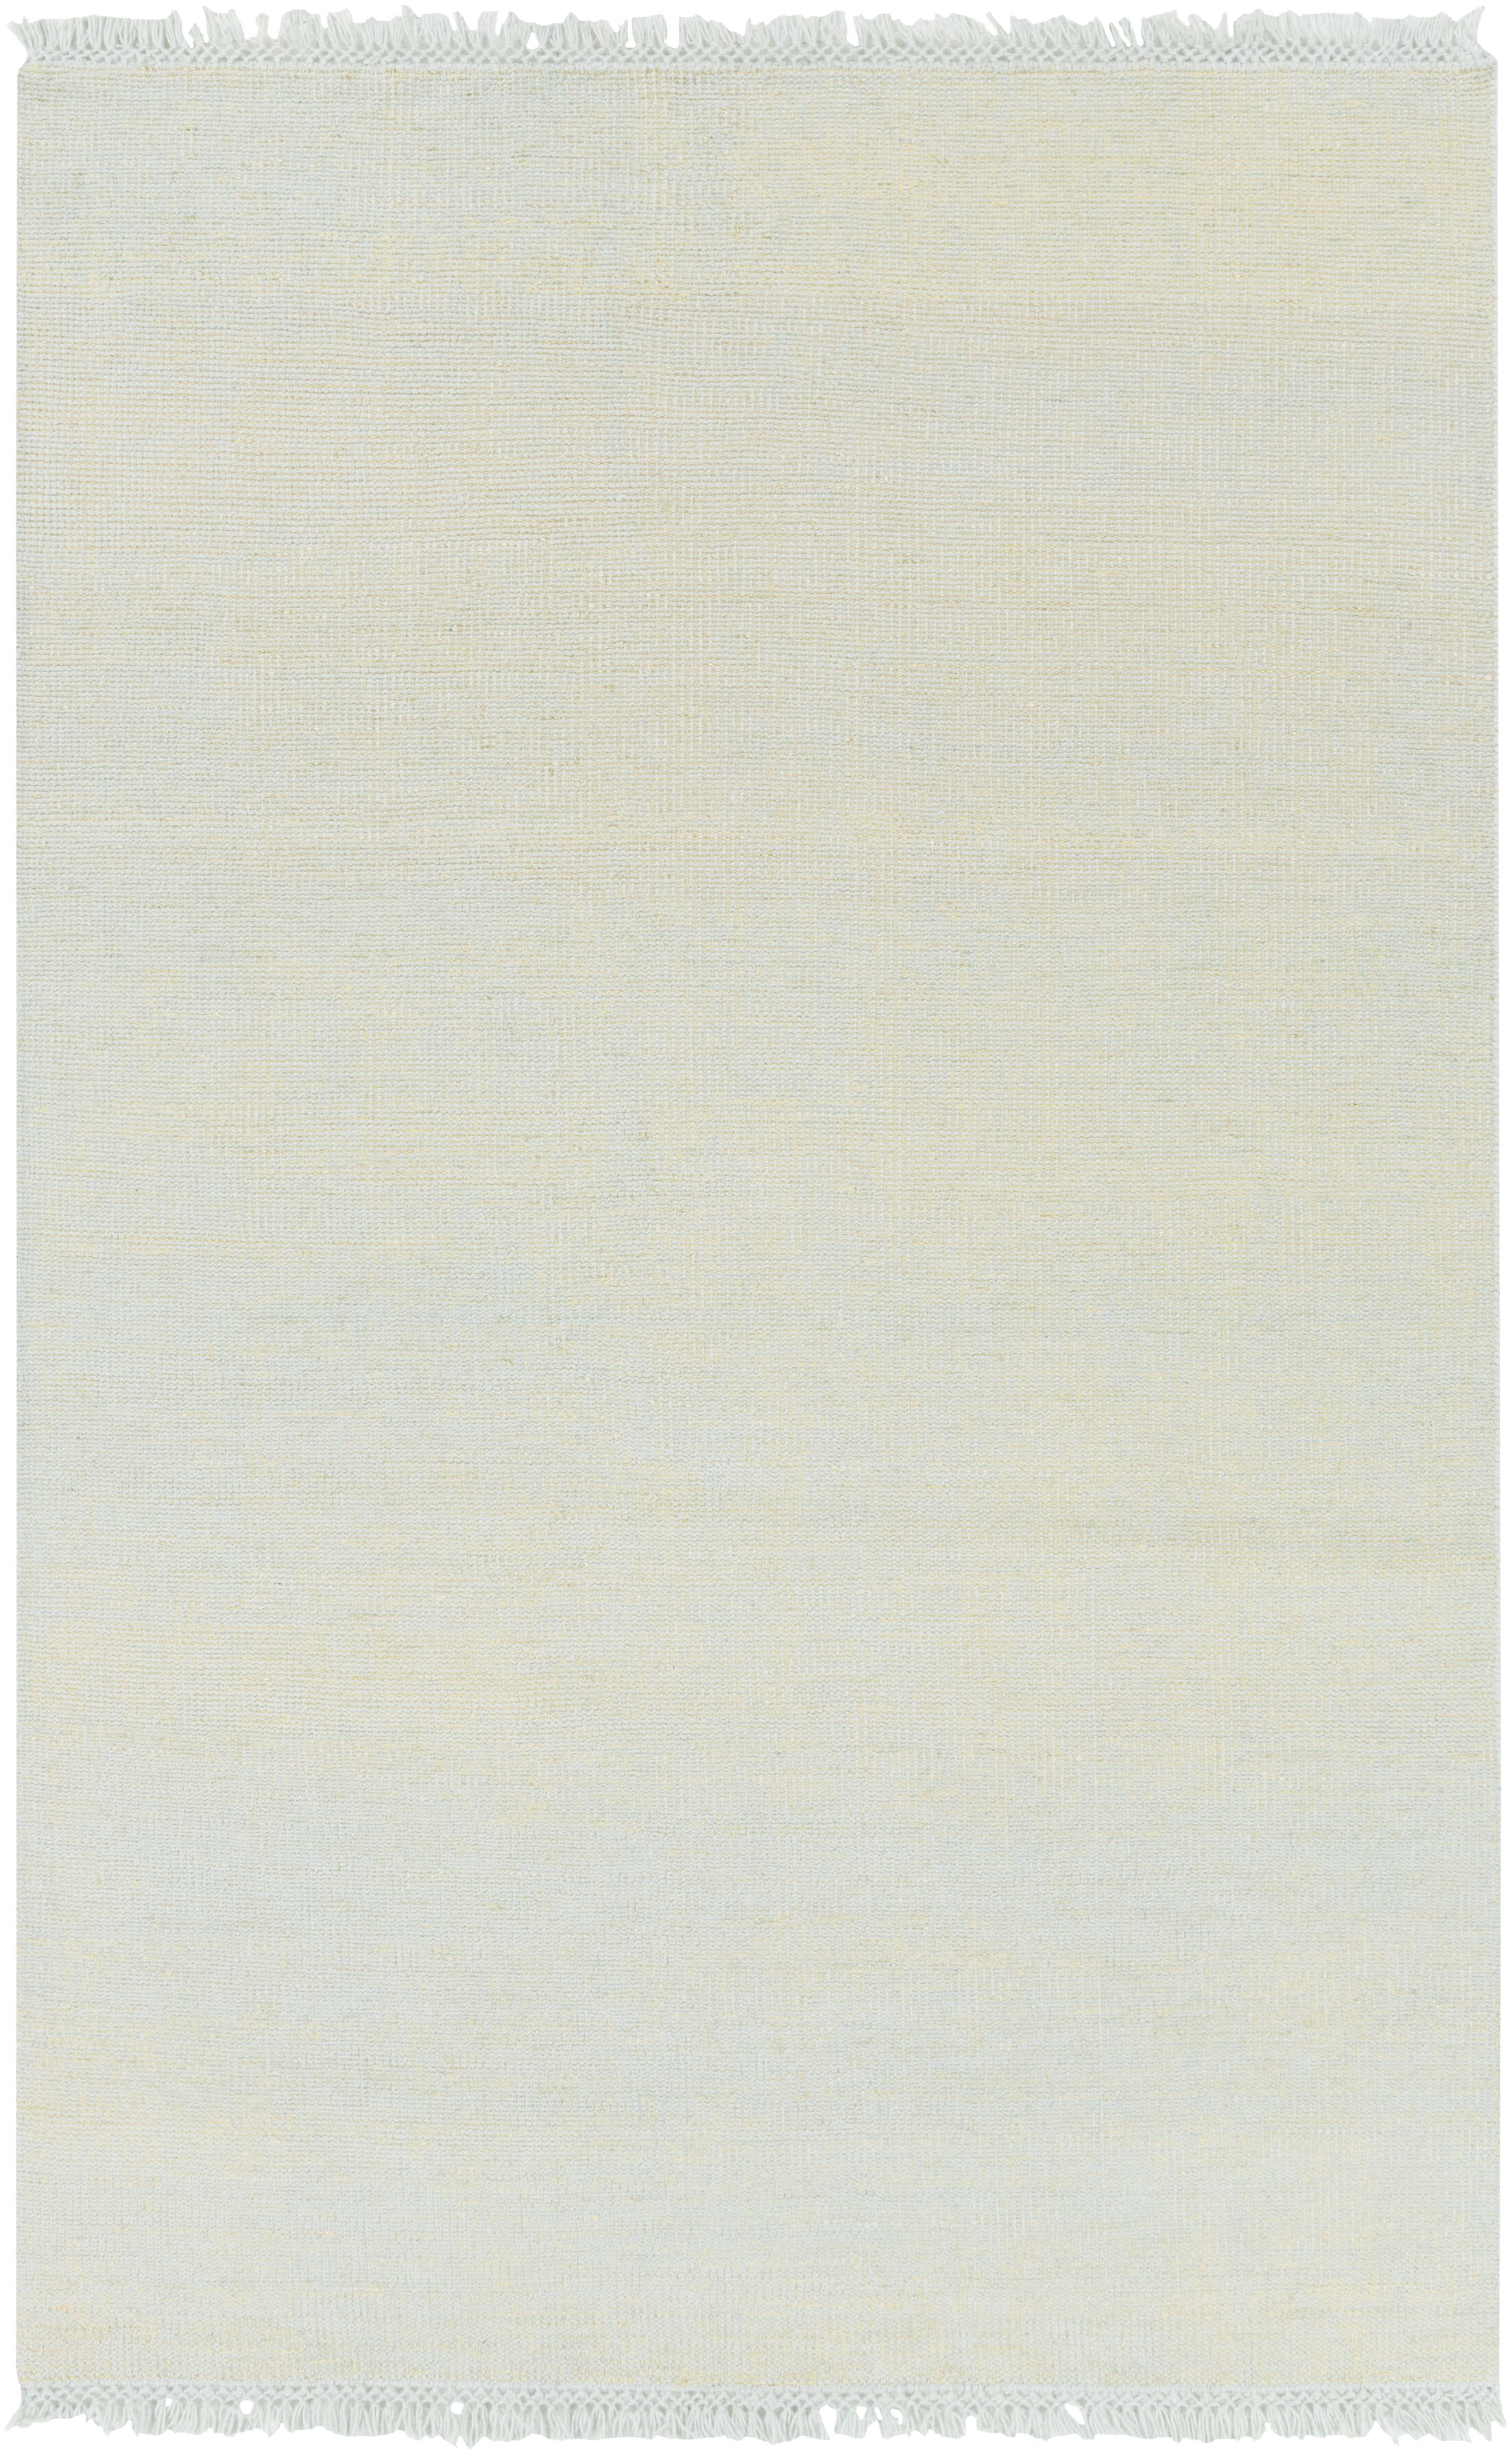 Yermo Sea Foam Area Rug Rug Size: Rectangle 6' x 9'